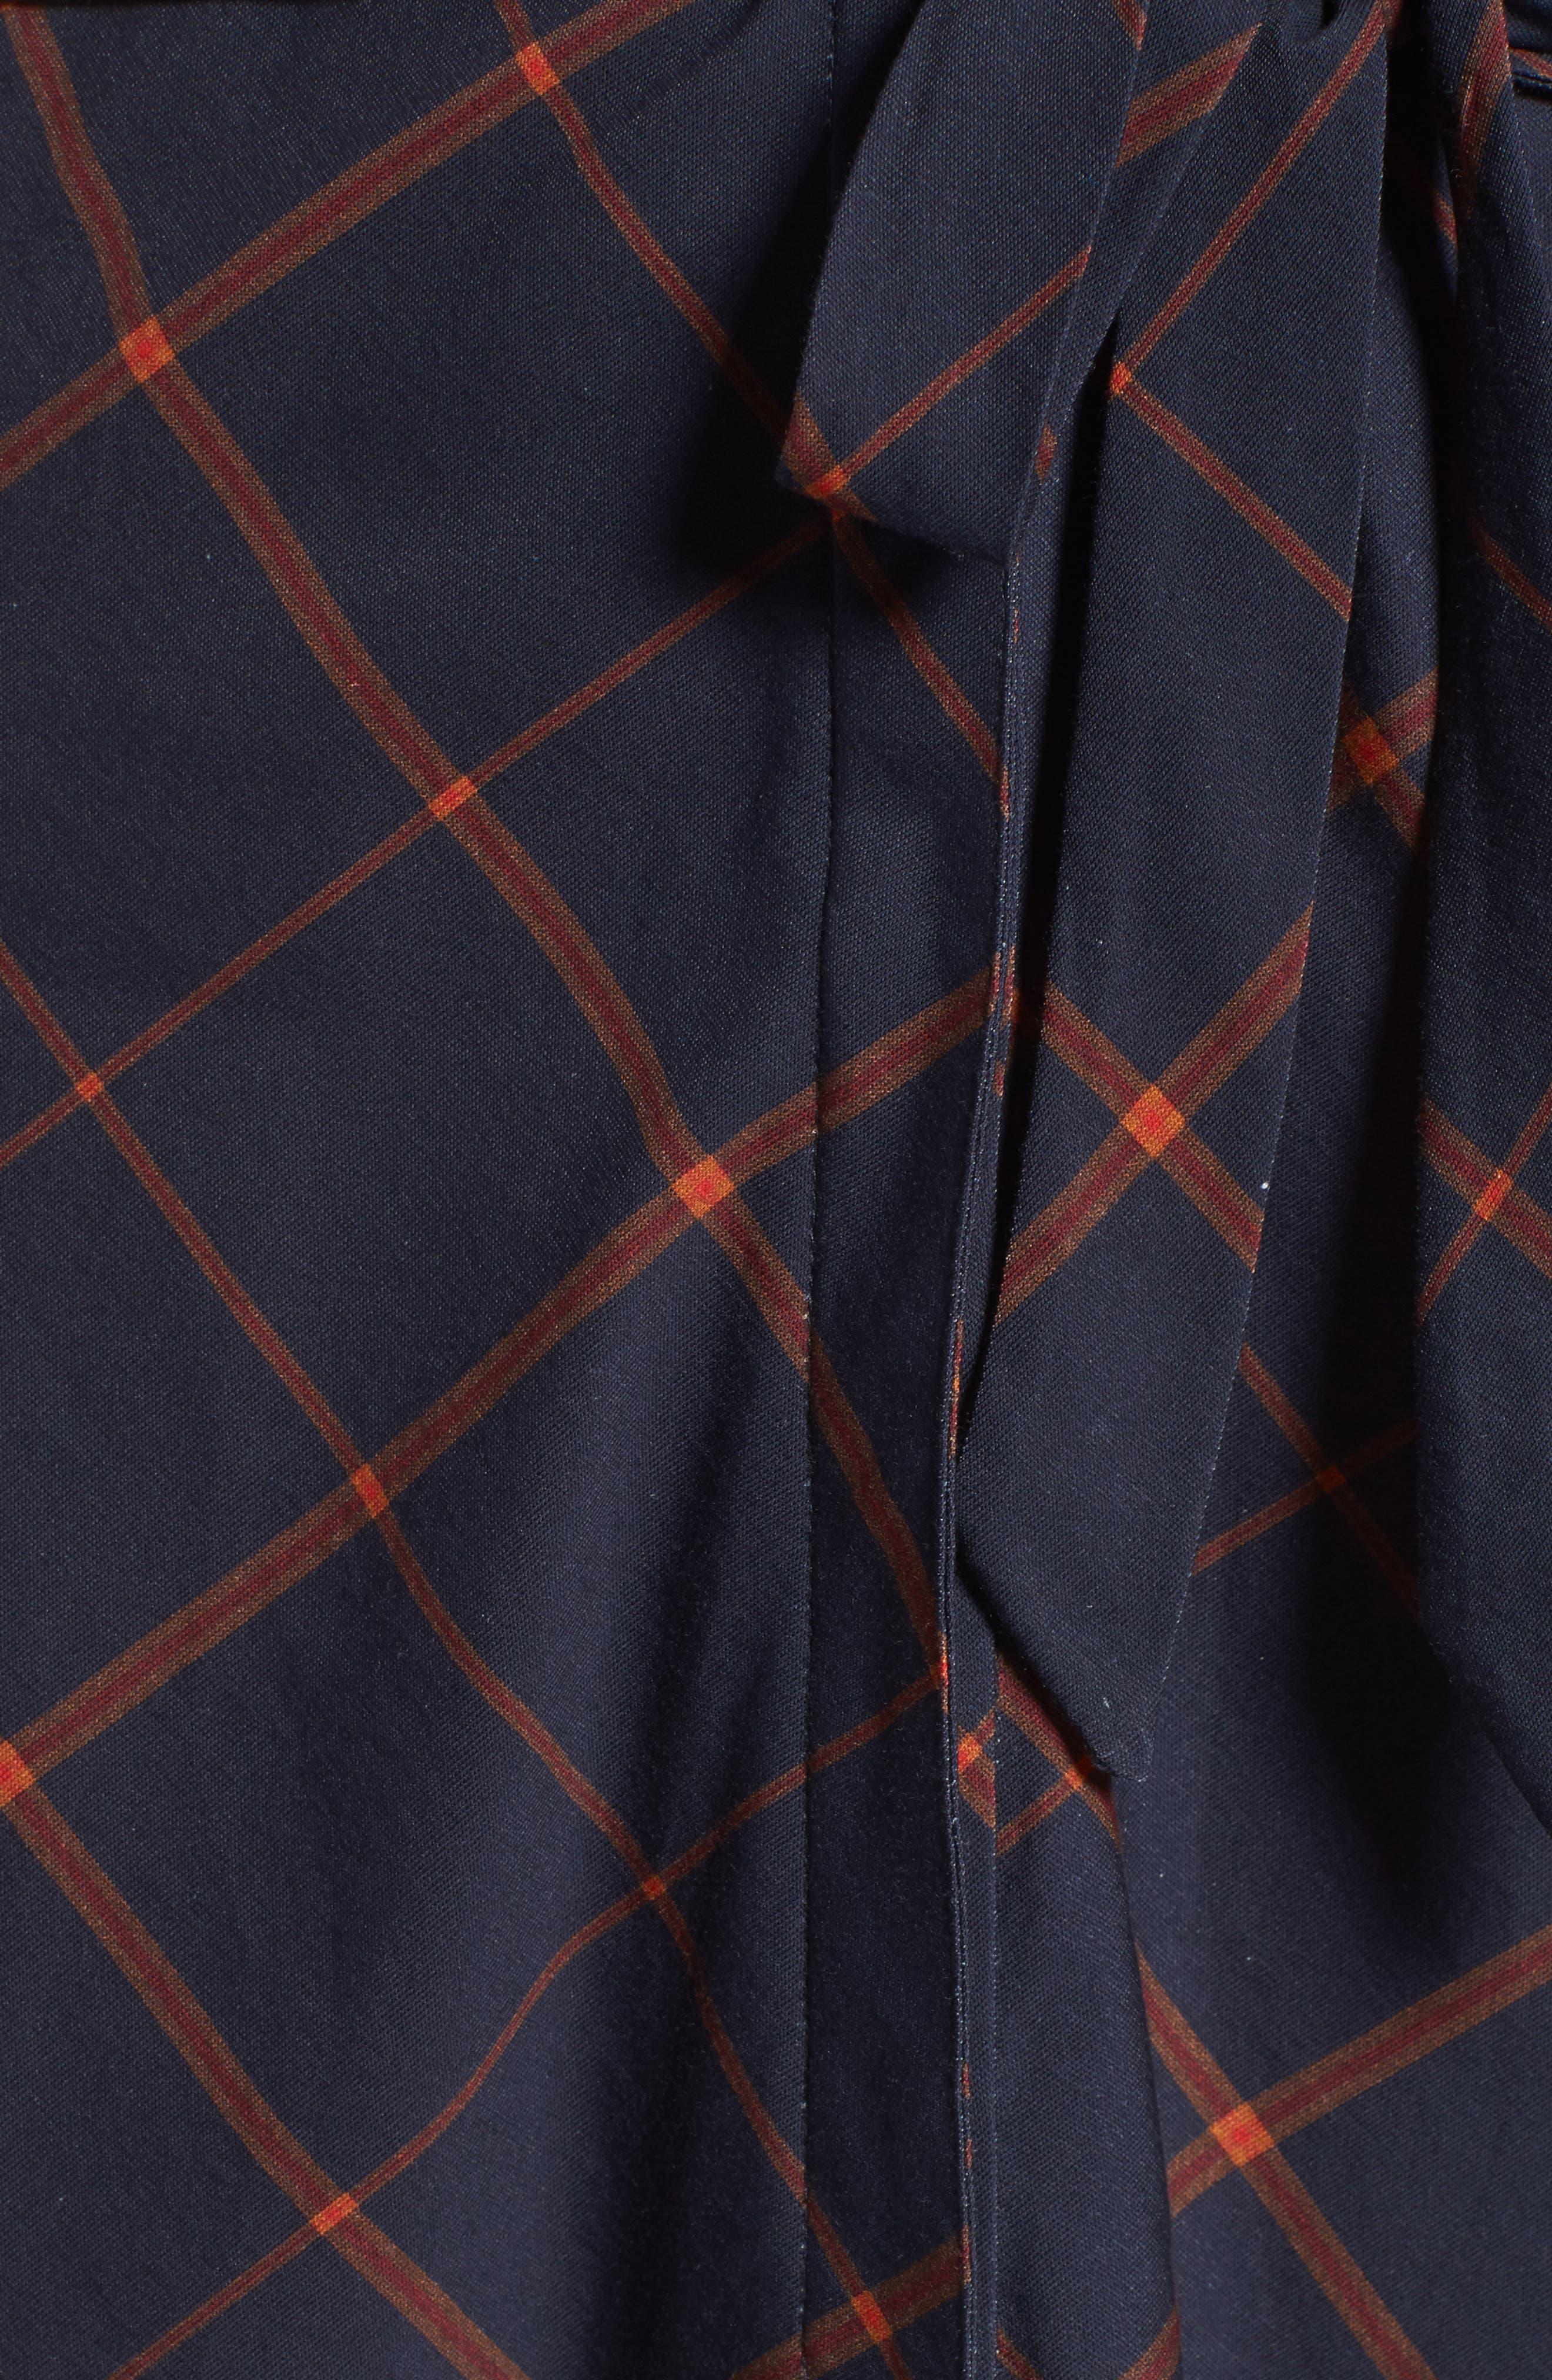 Glenrothes Windowpane Plaid Dress,                             Alternate thumbnail 5, color,                             Navy Check